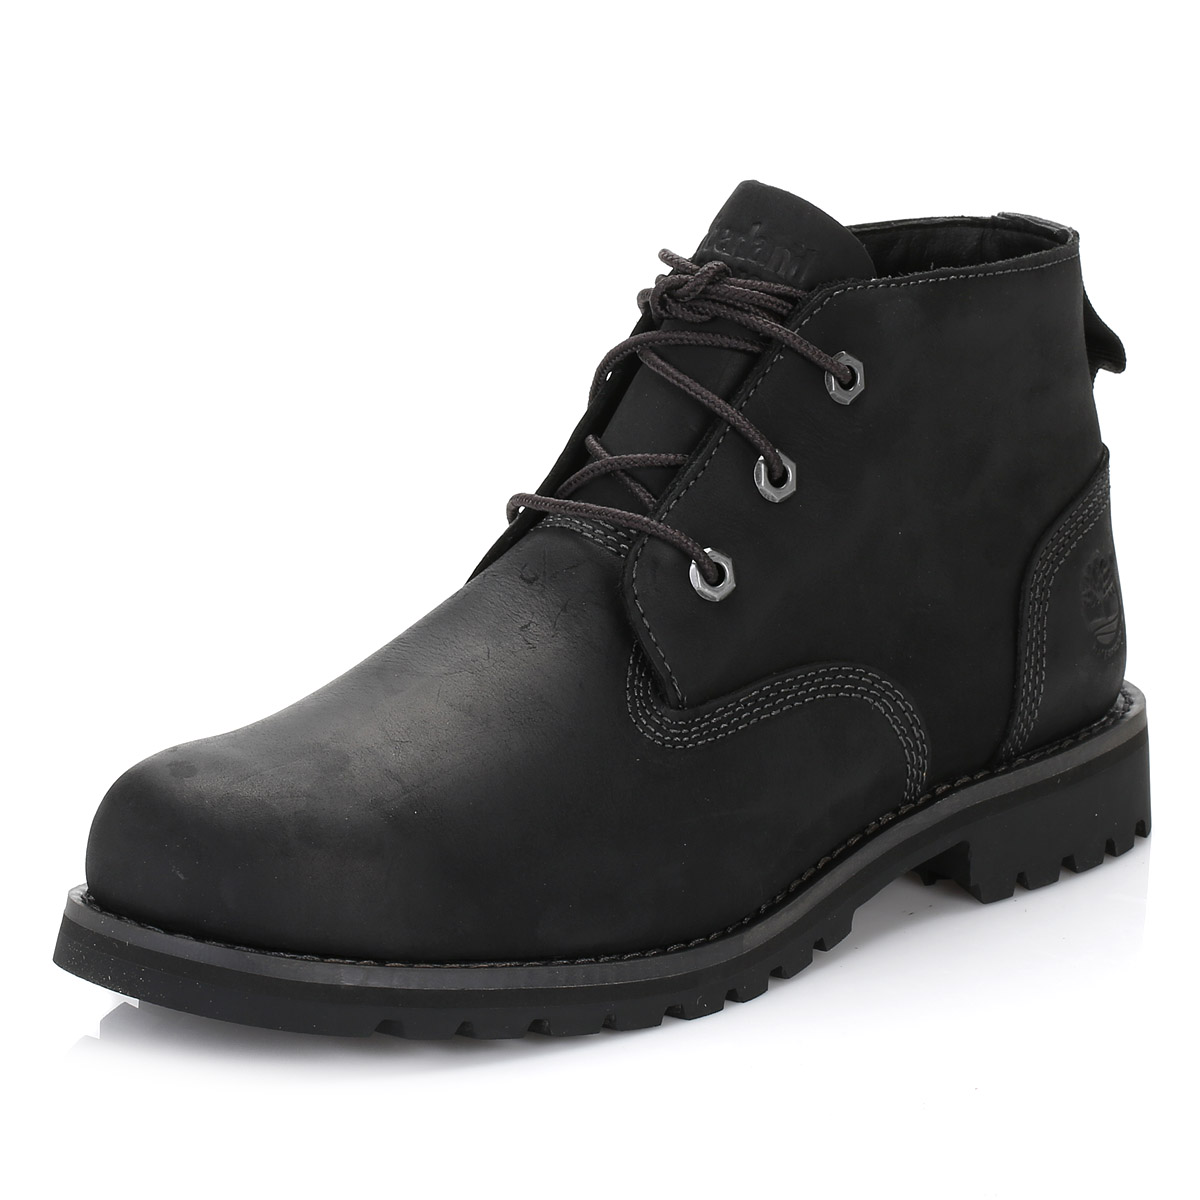 timberland mens chukka boots black